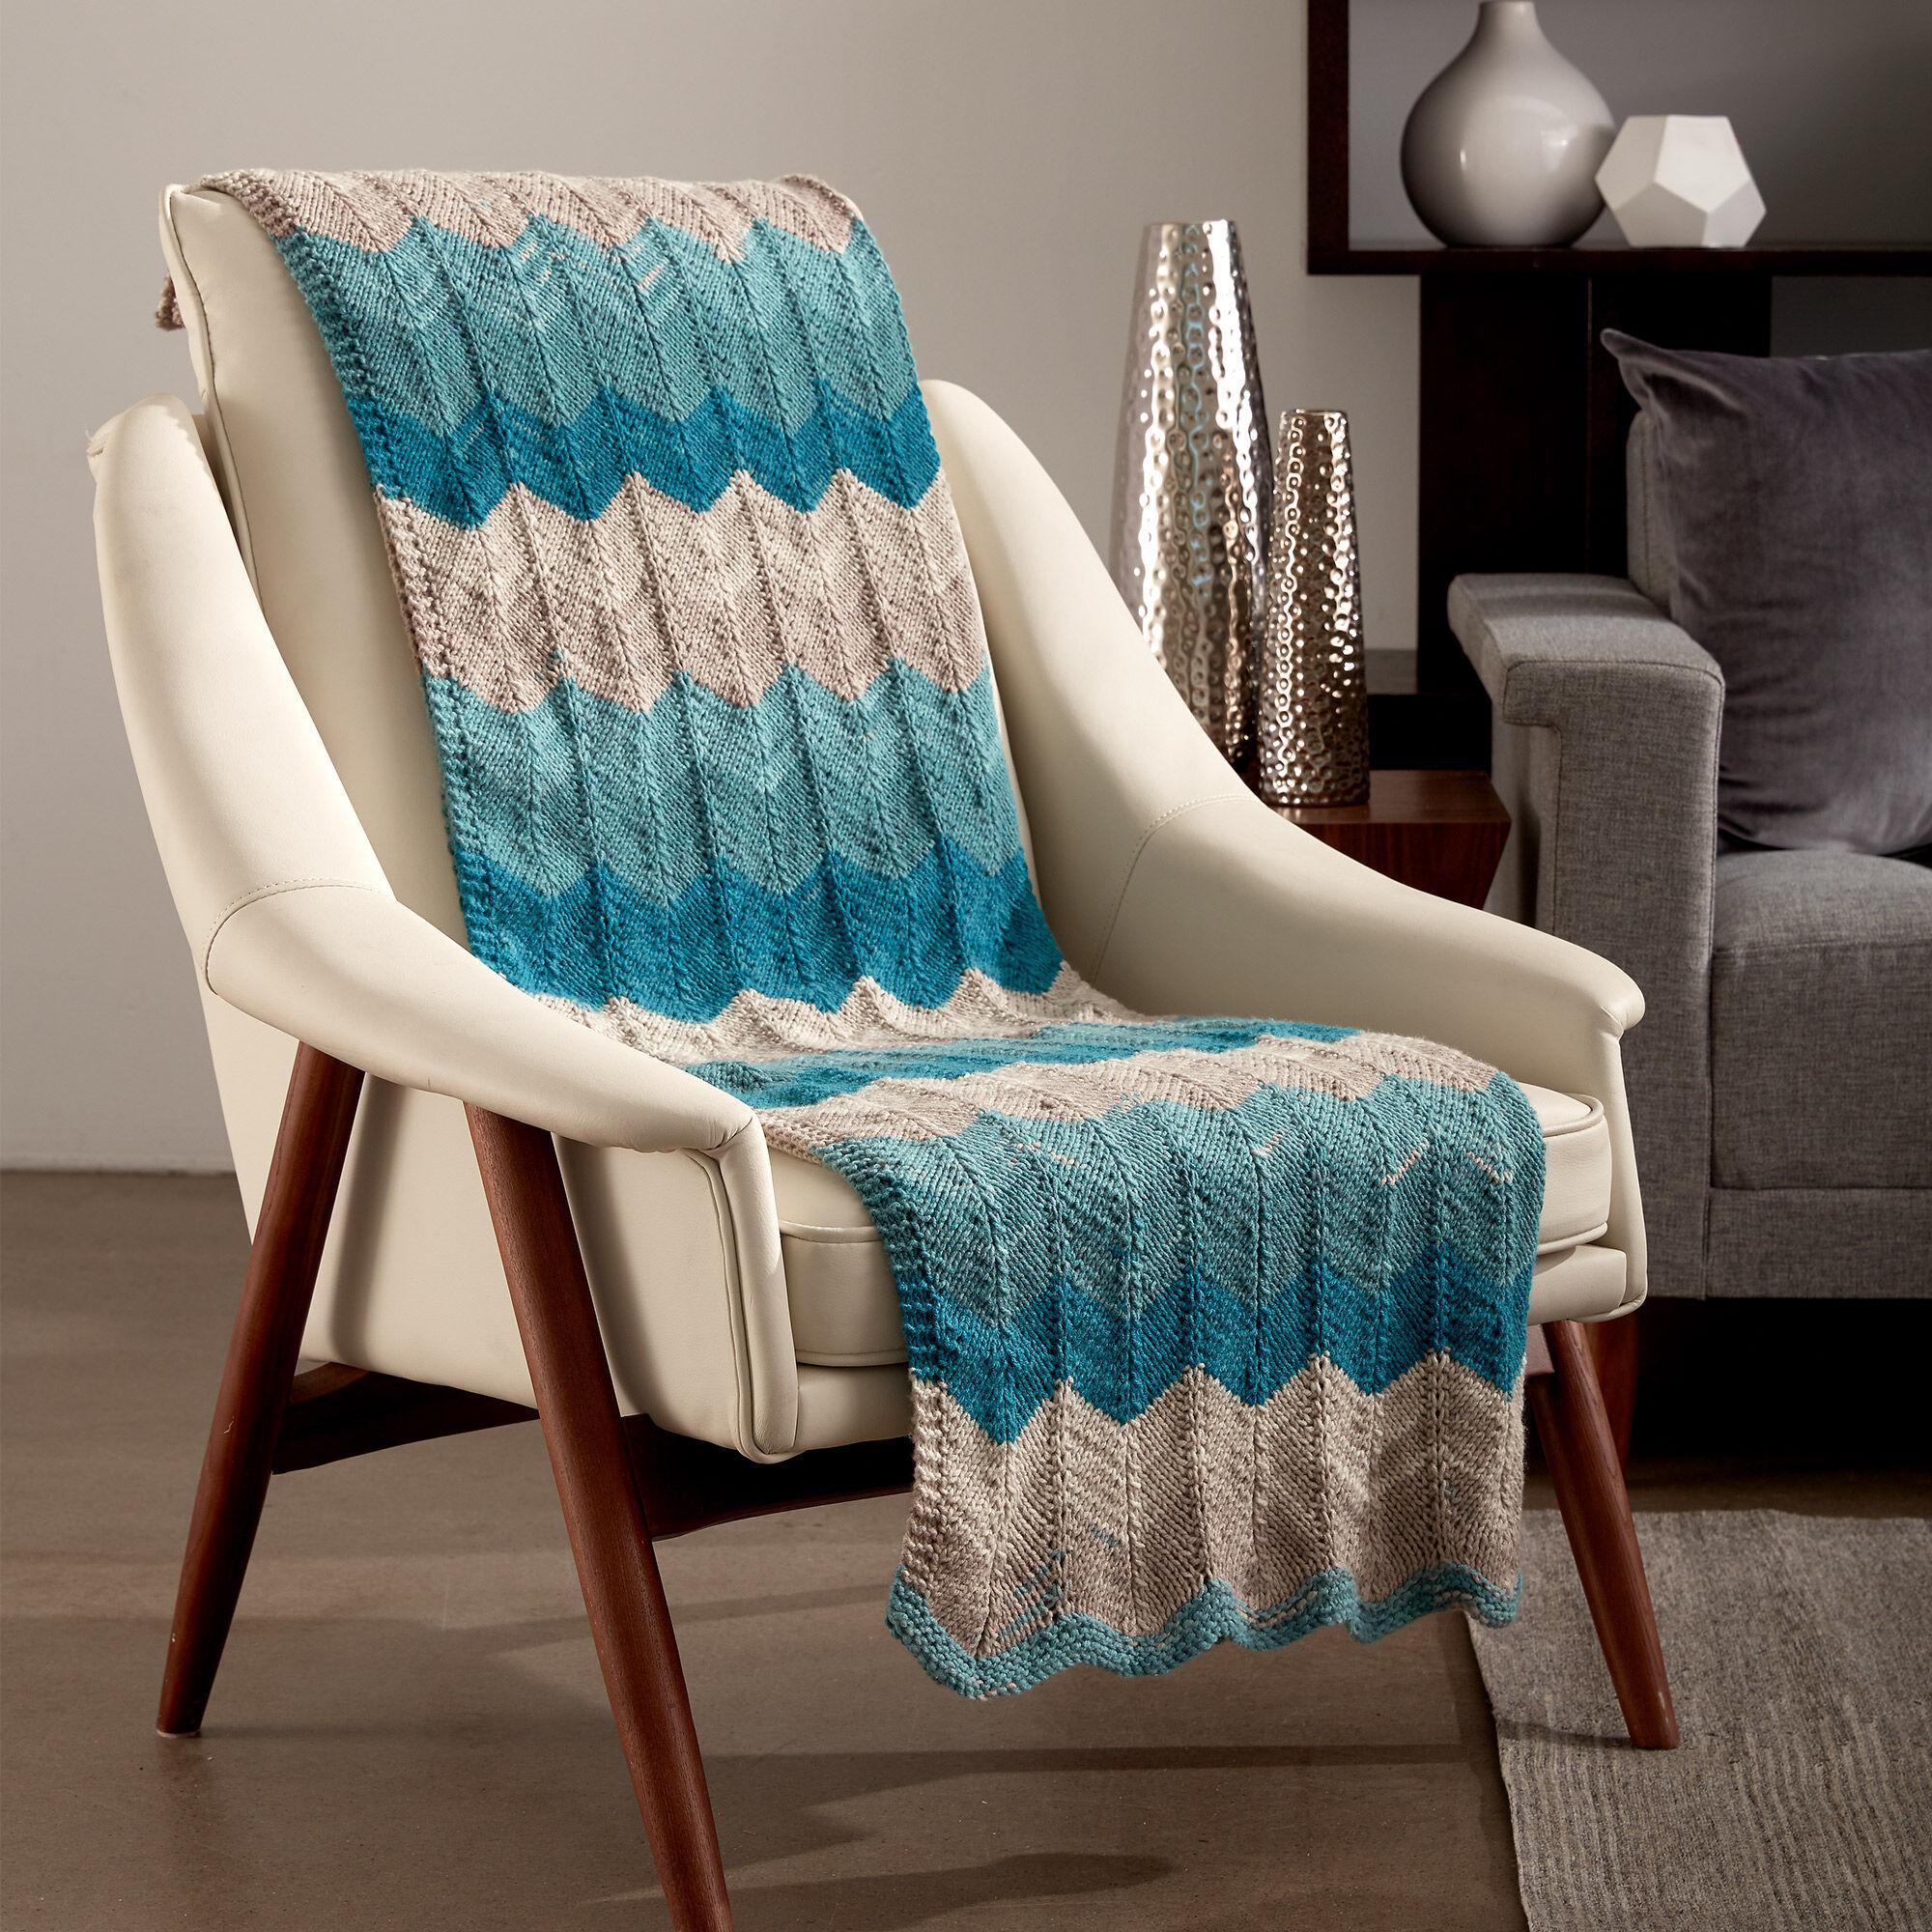 Caron Catch Some Waves Knit Blanket Pattern | Yarnspirations